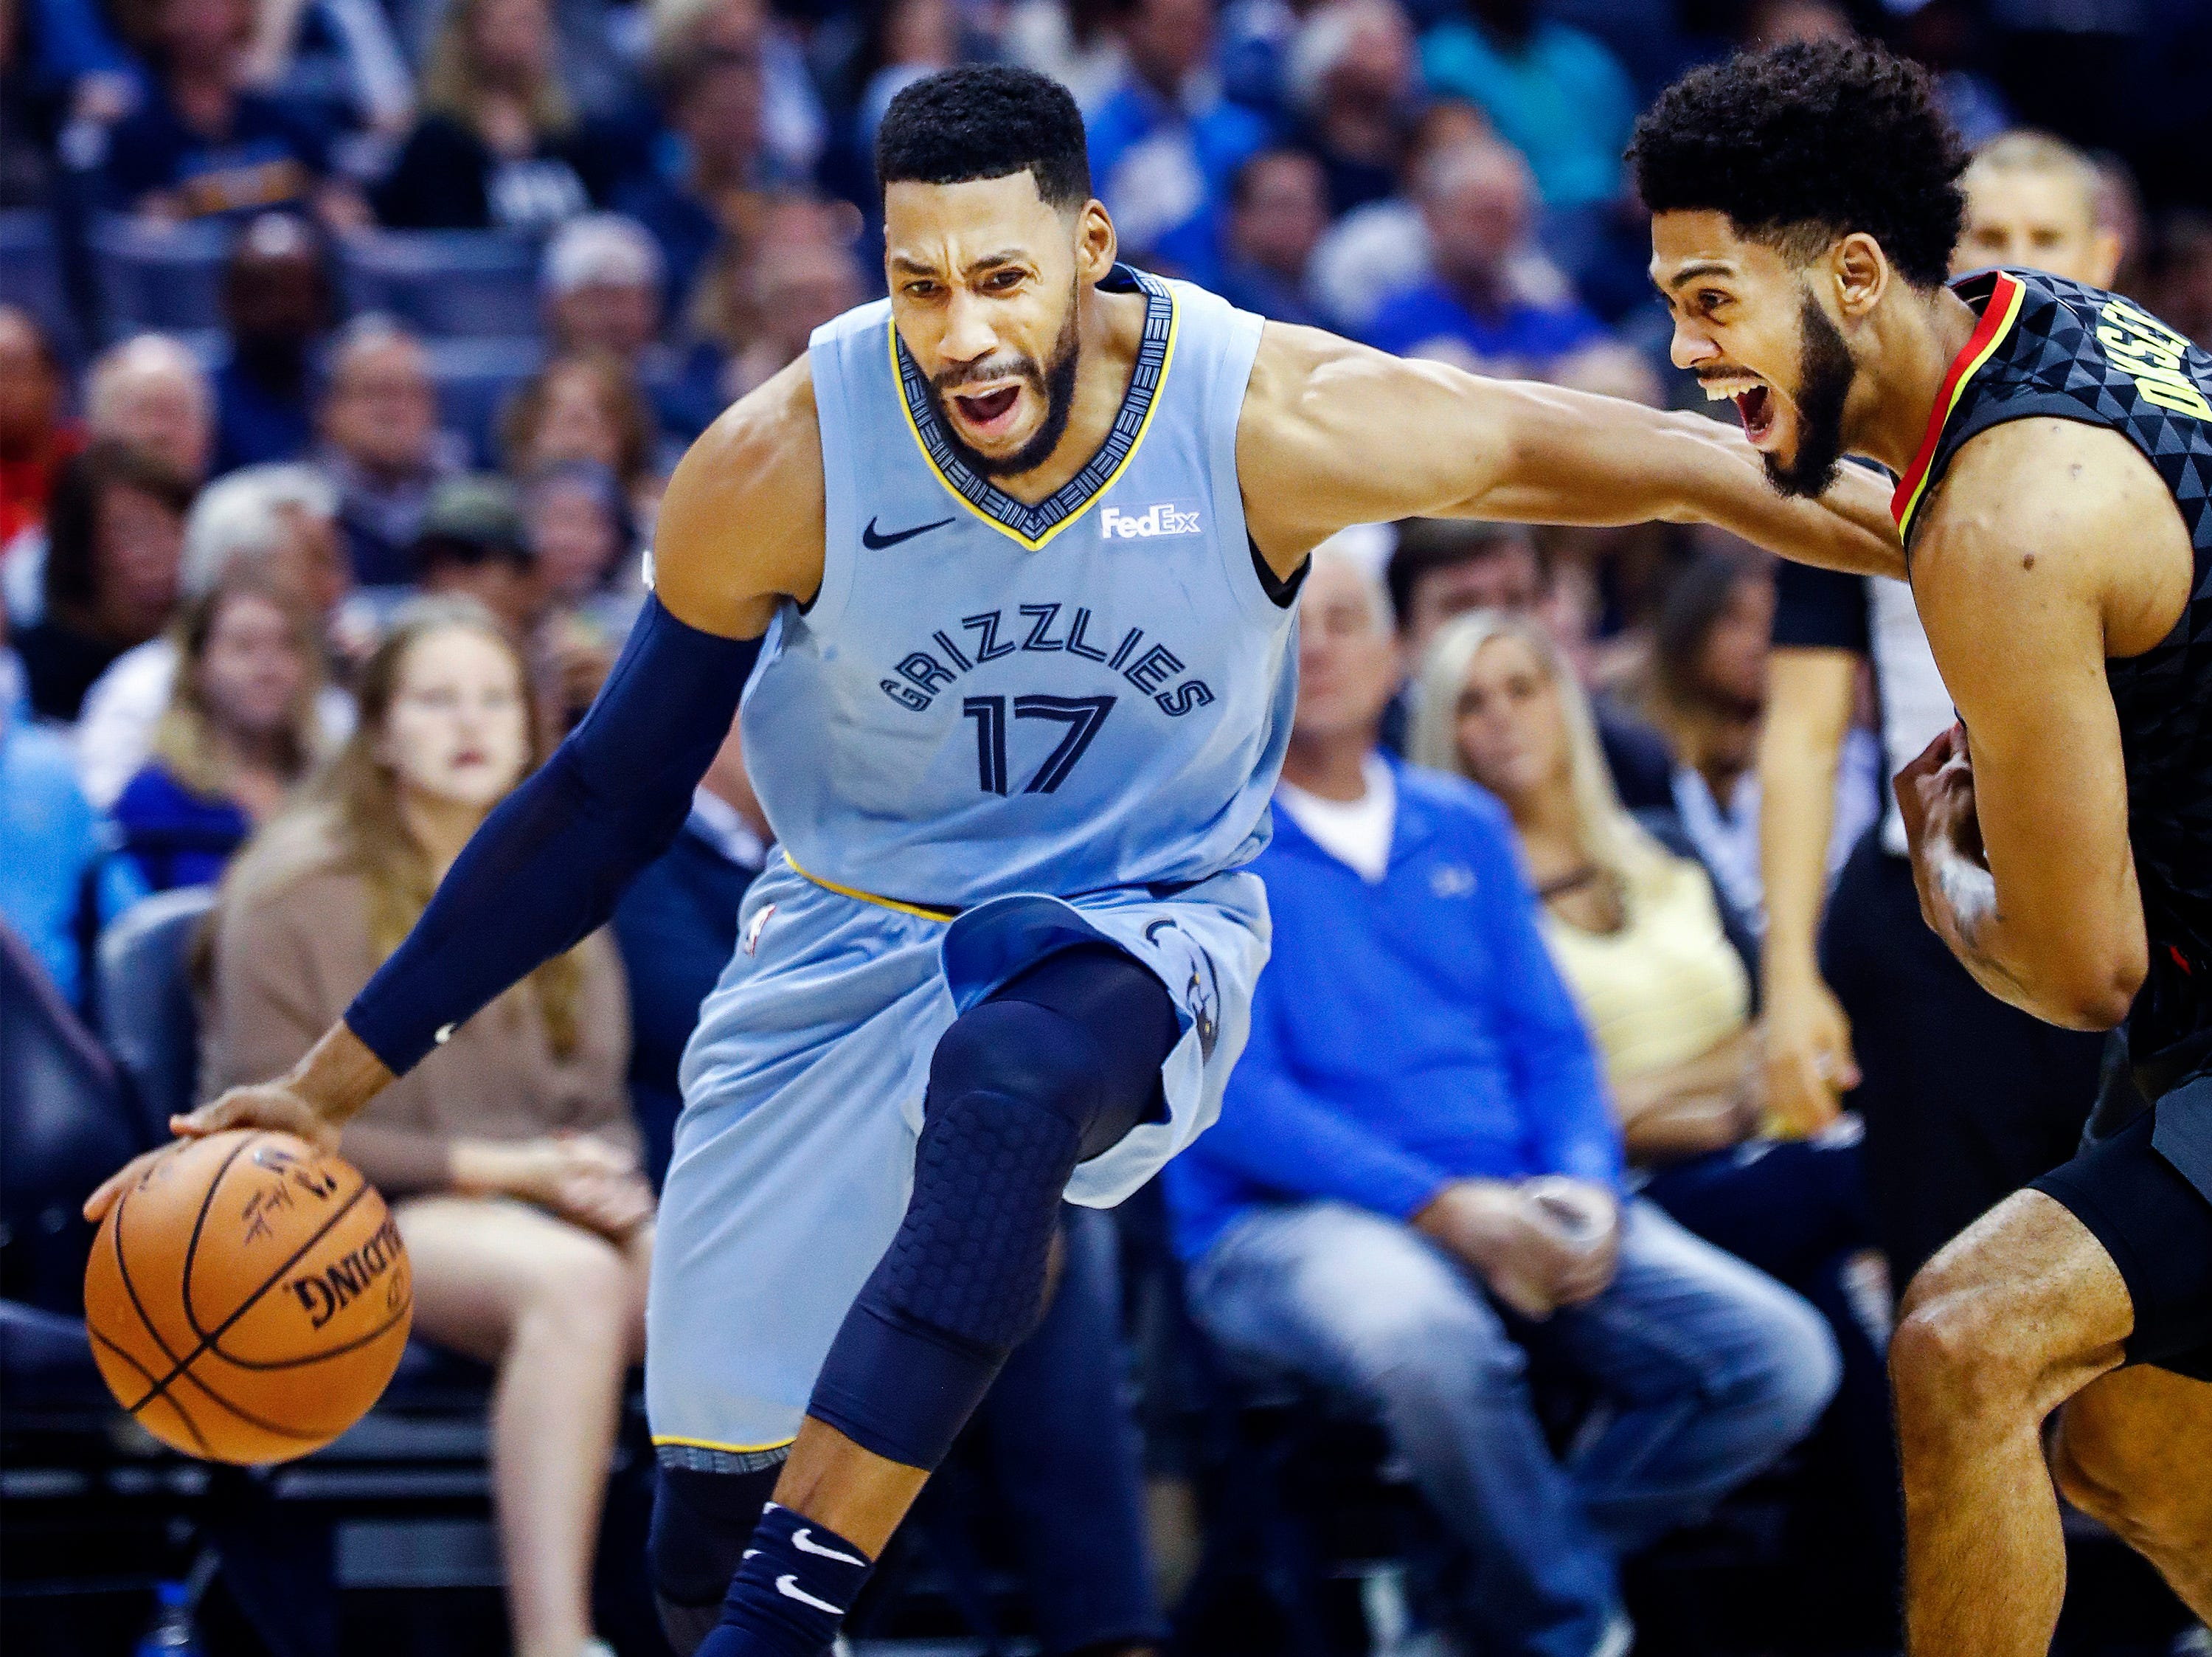 Memphis Grizzlies guard Garrett Temple (left) drives the lane against Atlanta Hawks defender Tyler Dorsey (right) in their home-opener at the FedExForum in Memphis, Tenn., Friday, October 19, 2018.